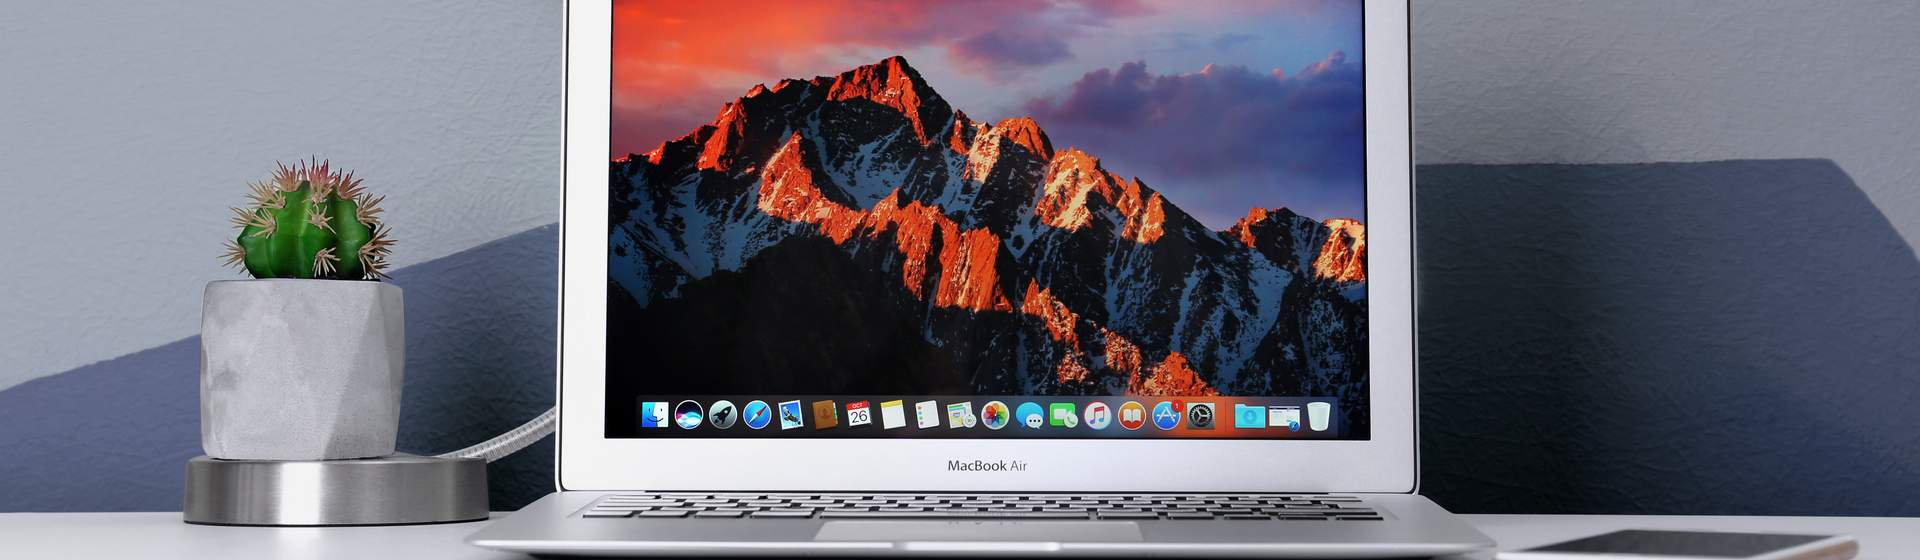 MacBook Air 2017 ainda vale a pena? Veja análise do notebook da Apple